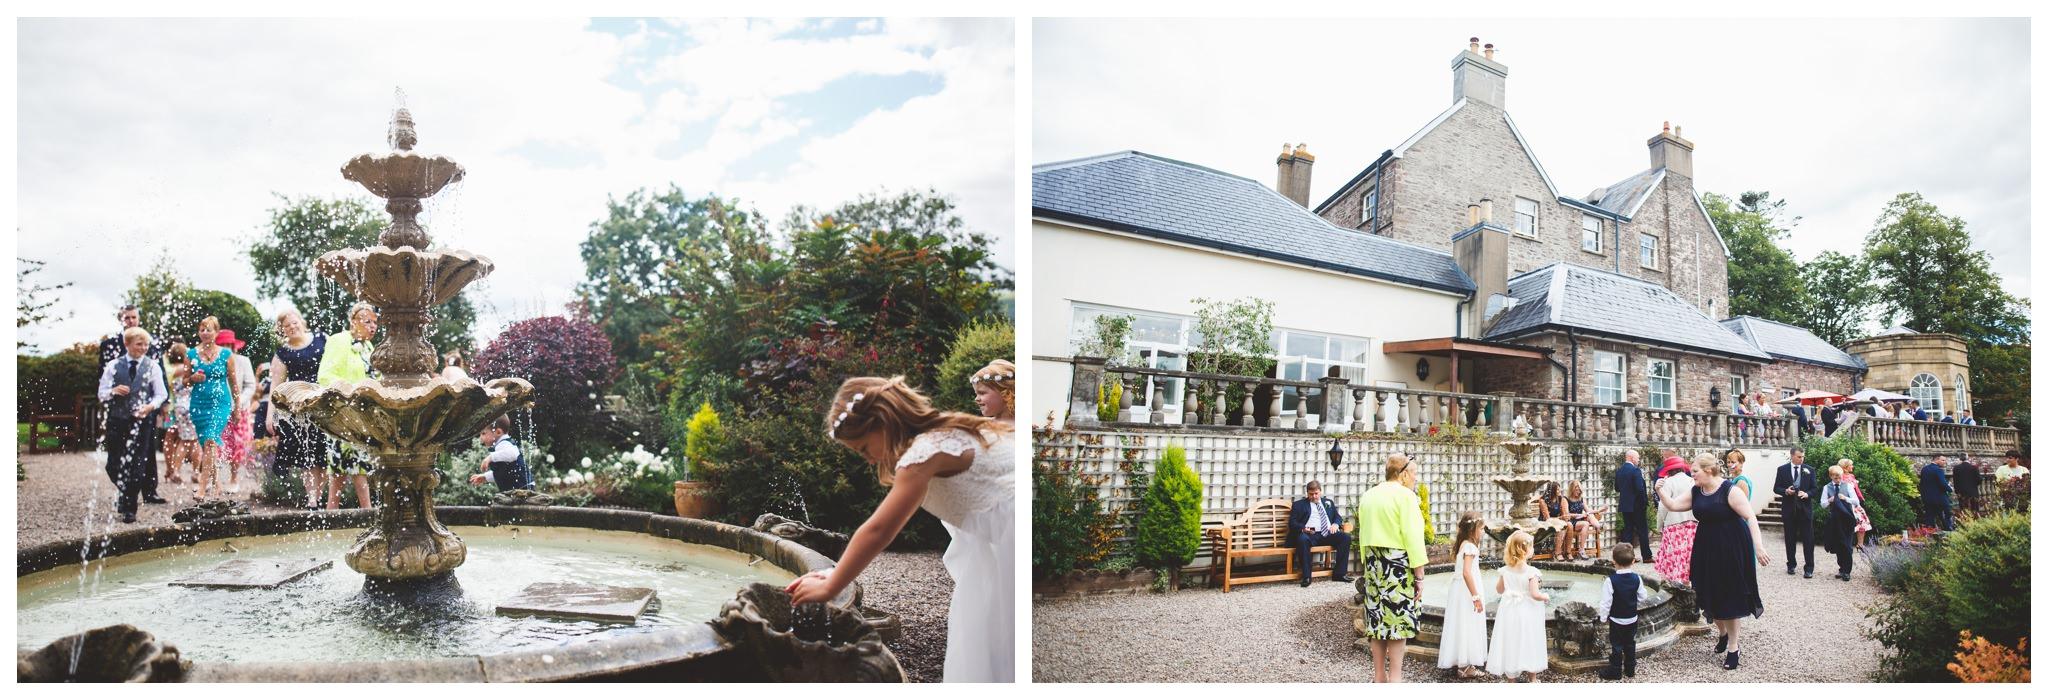 Richard Savage Photography - Wedding - Peterstone Court Brecon - 2016-05-11_0033